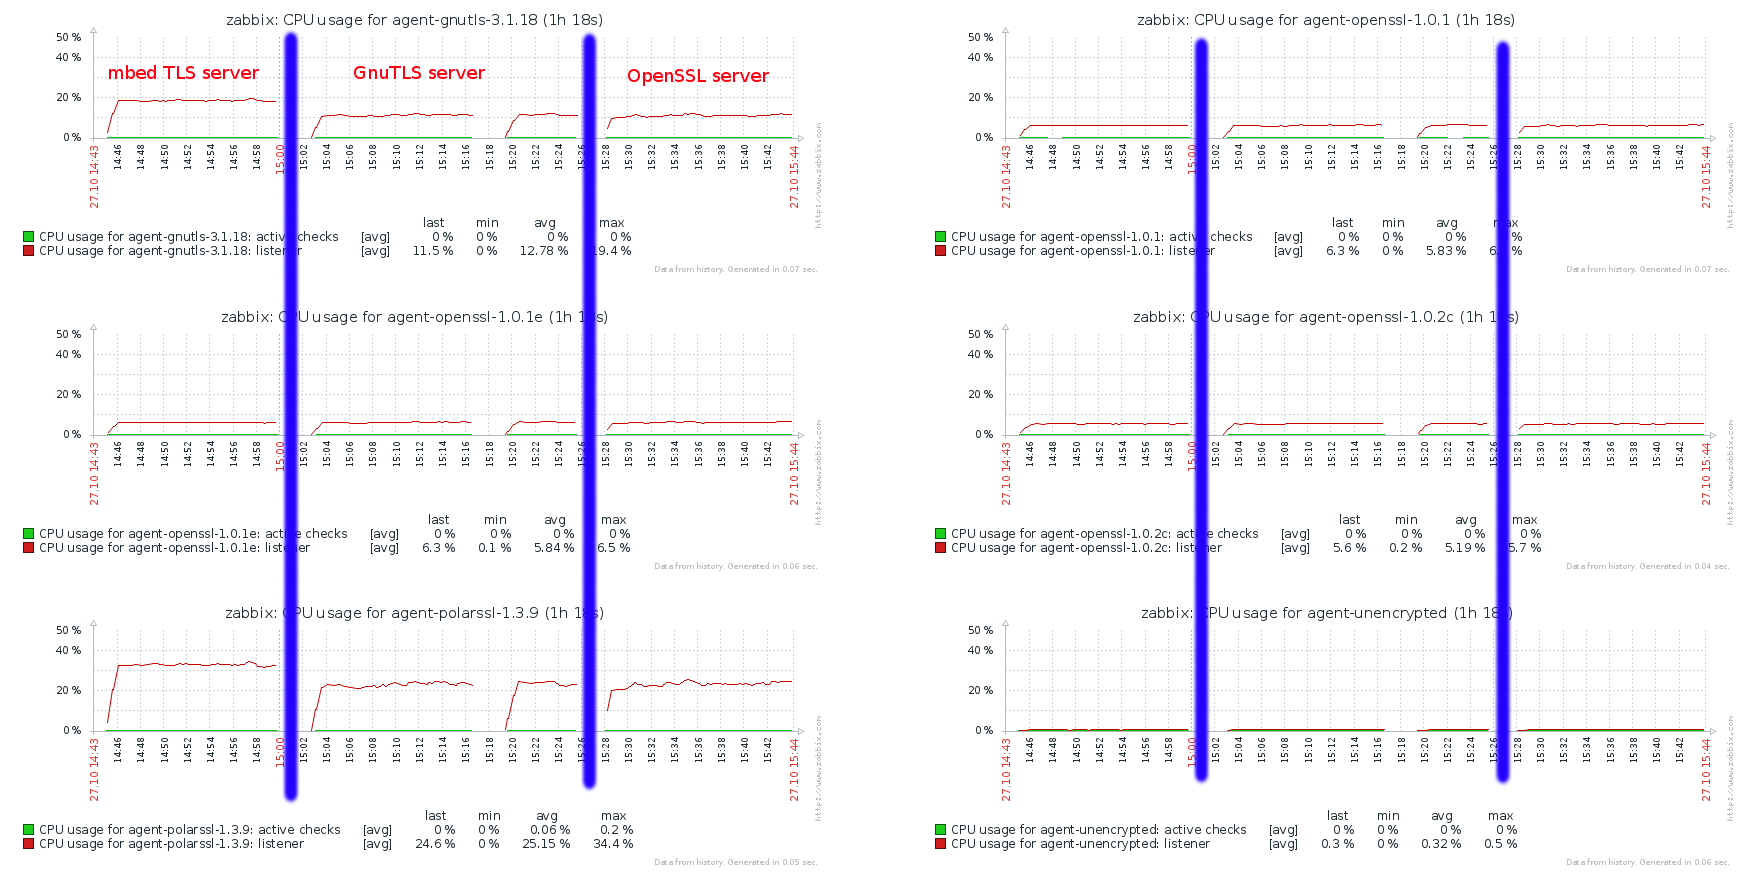 ZBXNEXT-1263] daemon communication encryption: ssl - ZABBIX